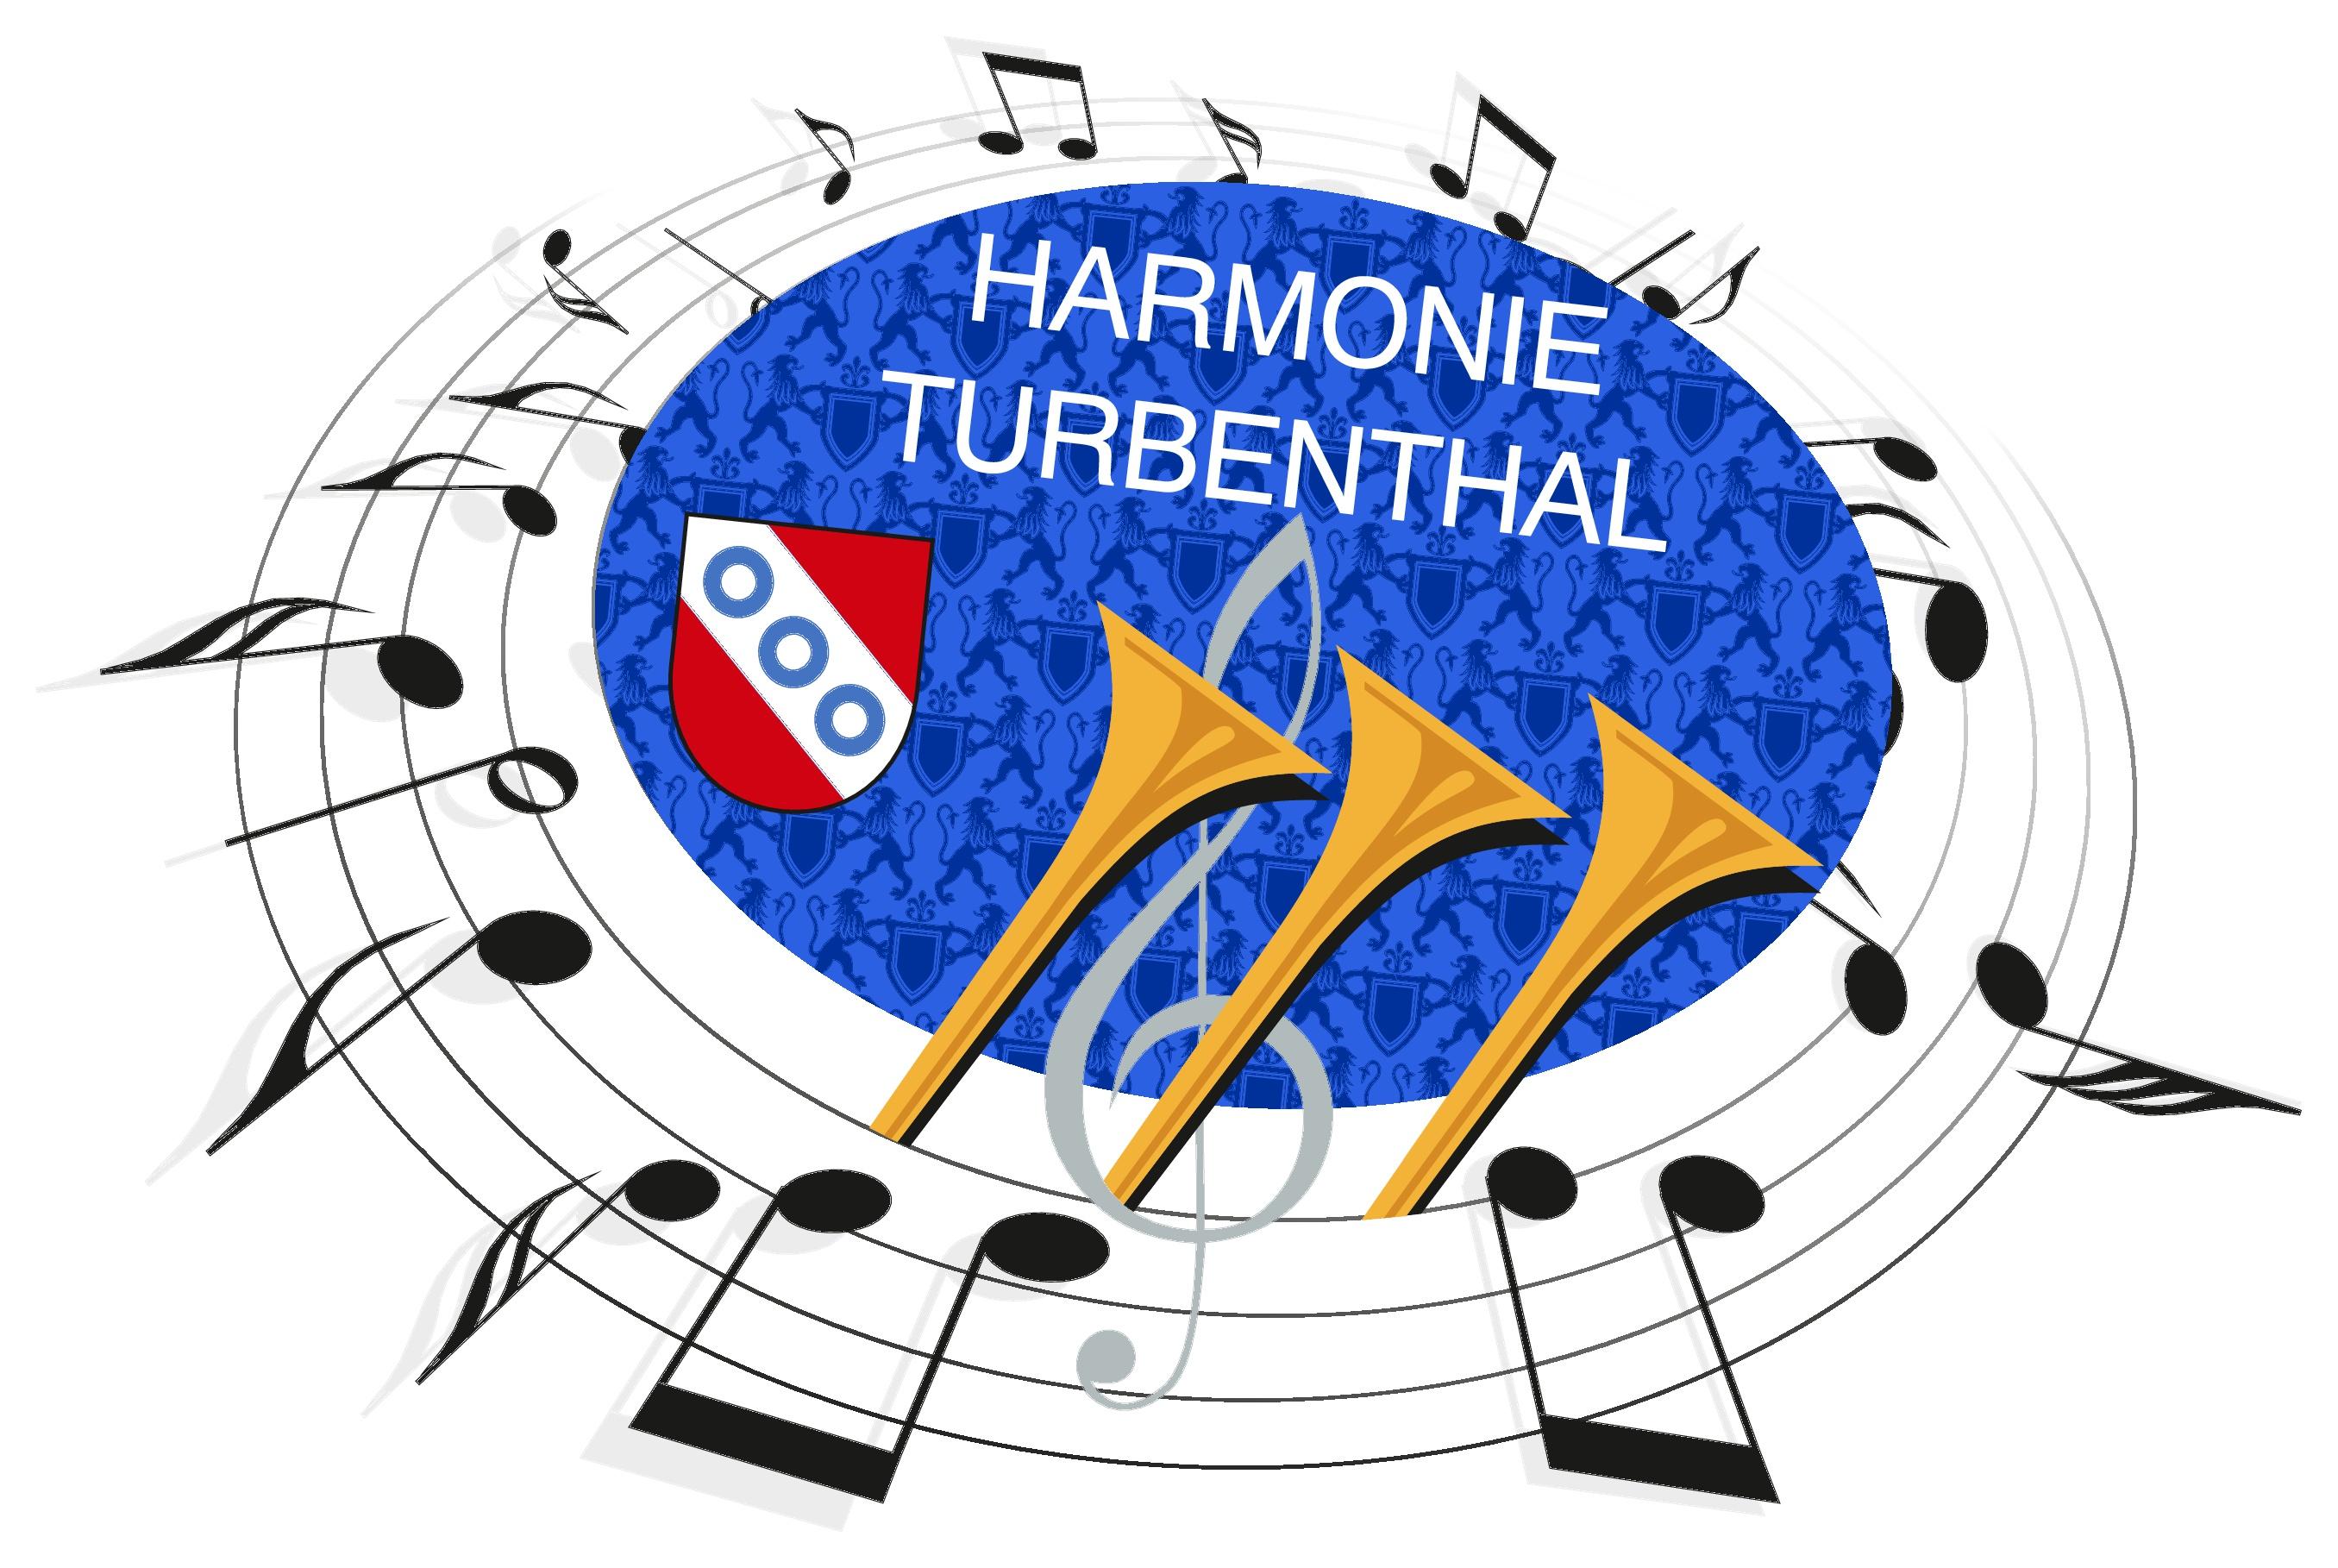 Musikgesellschaft Harmonie Turbenthal